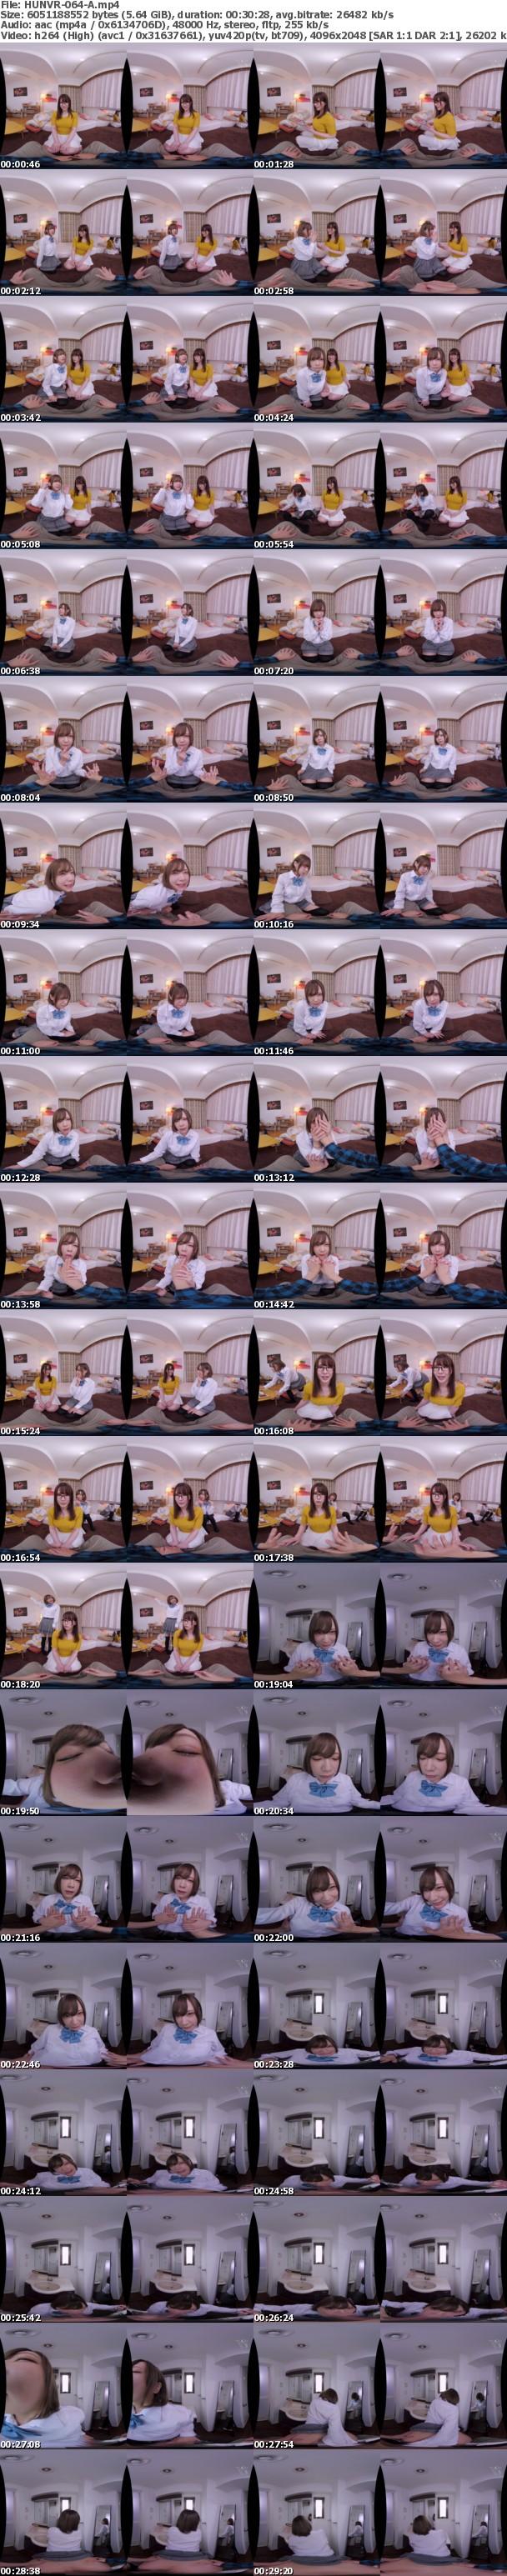 (VR) HUNVR-064 『お姉ちゃんとまだエッチしてないんだって?じゃ~私が先にしちゃおうかな~』彼女の家に遊びに行ったら超真面目な彼女とは性格もスタイルも正反対の超ヤリマンで小悪魔な妹がいた!しかも昔から親に出来の良い彼女(お姉ちゃん)と比較されてきたからお姉ちゃん…